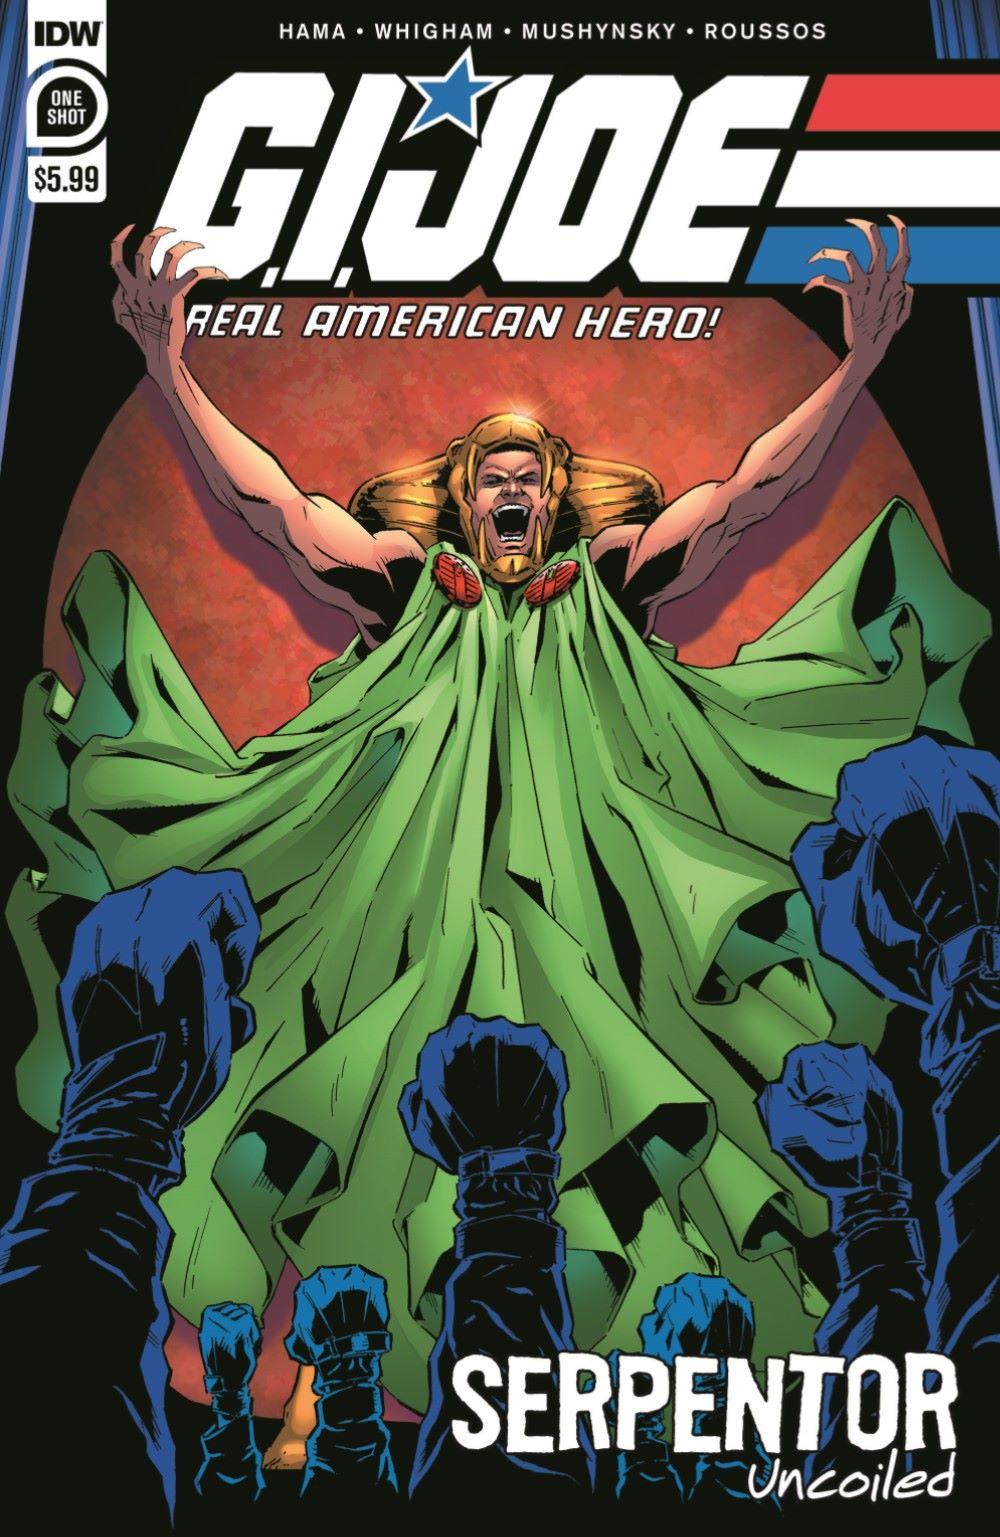 GIJoeRAH_SerpentorUncoiled-pr-01 ComicList Previews: G.I. JOE A REAL AMERICAN HERO SERPENTOR UNCOILED #1